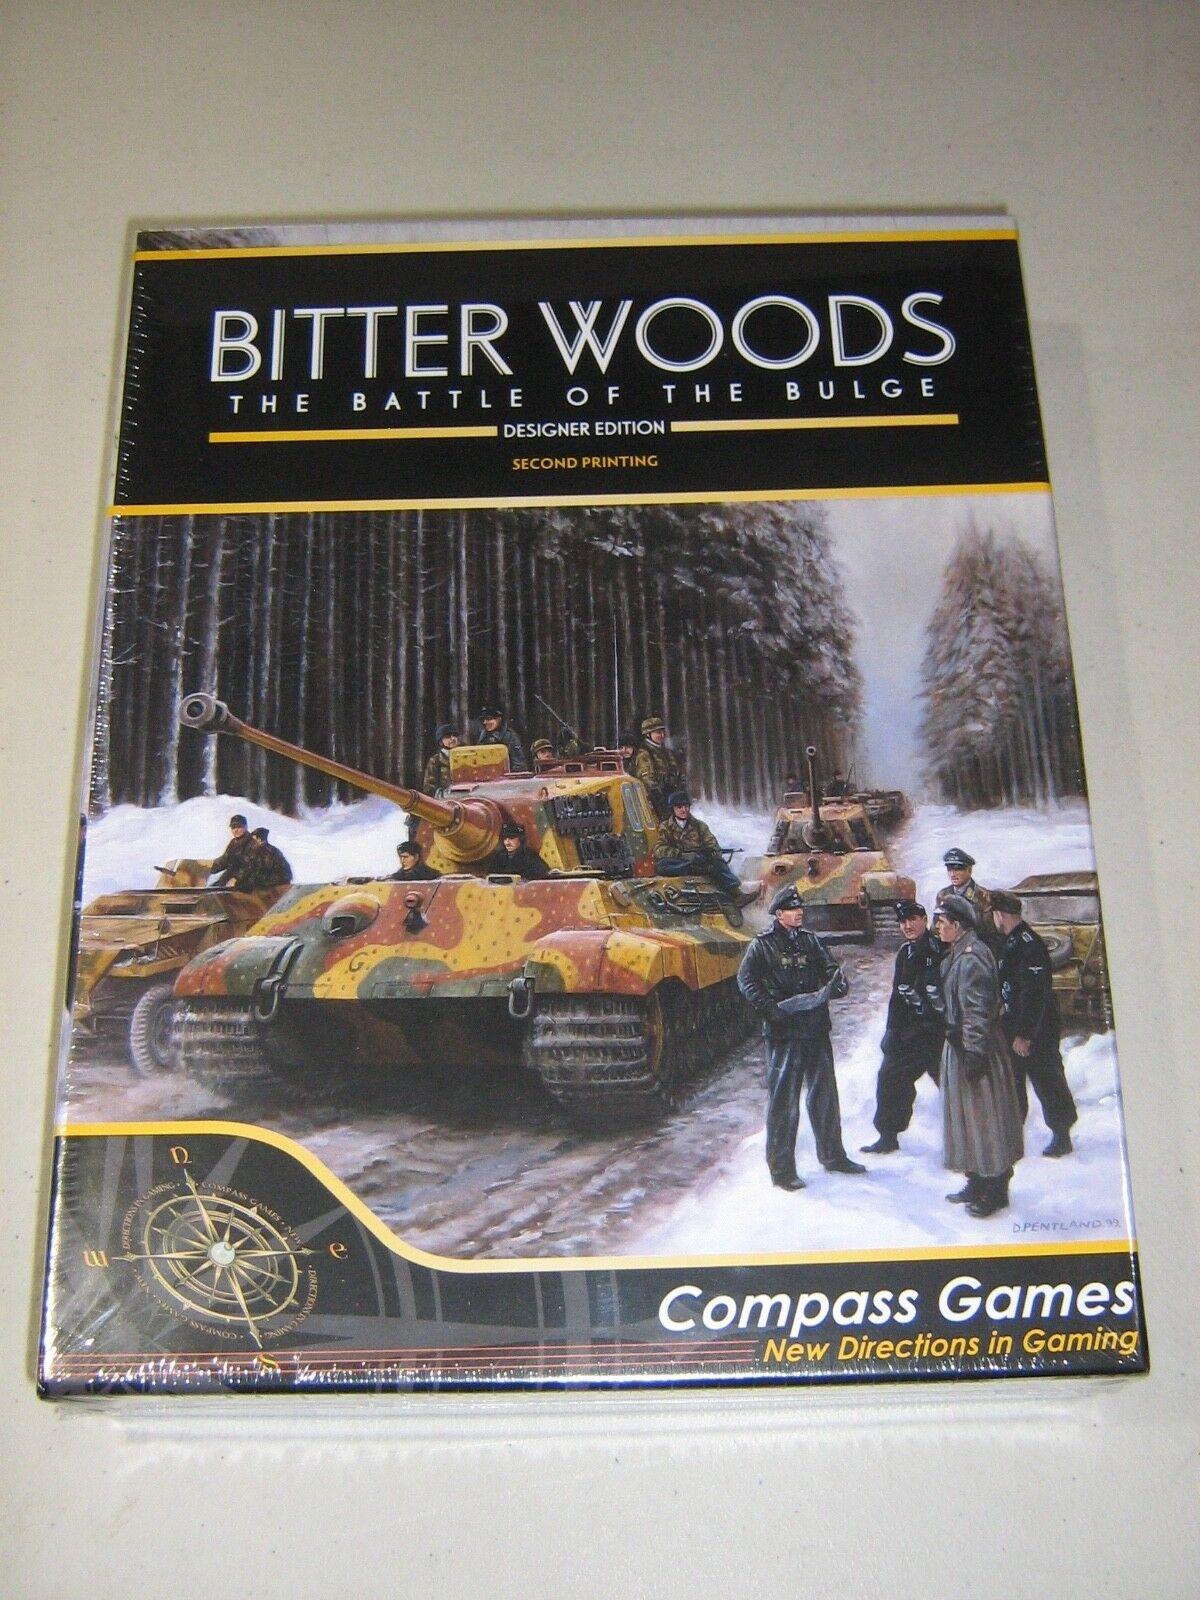 Bitter Woods Designer Edition 2nd Printing (New)